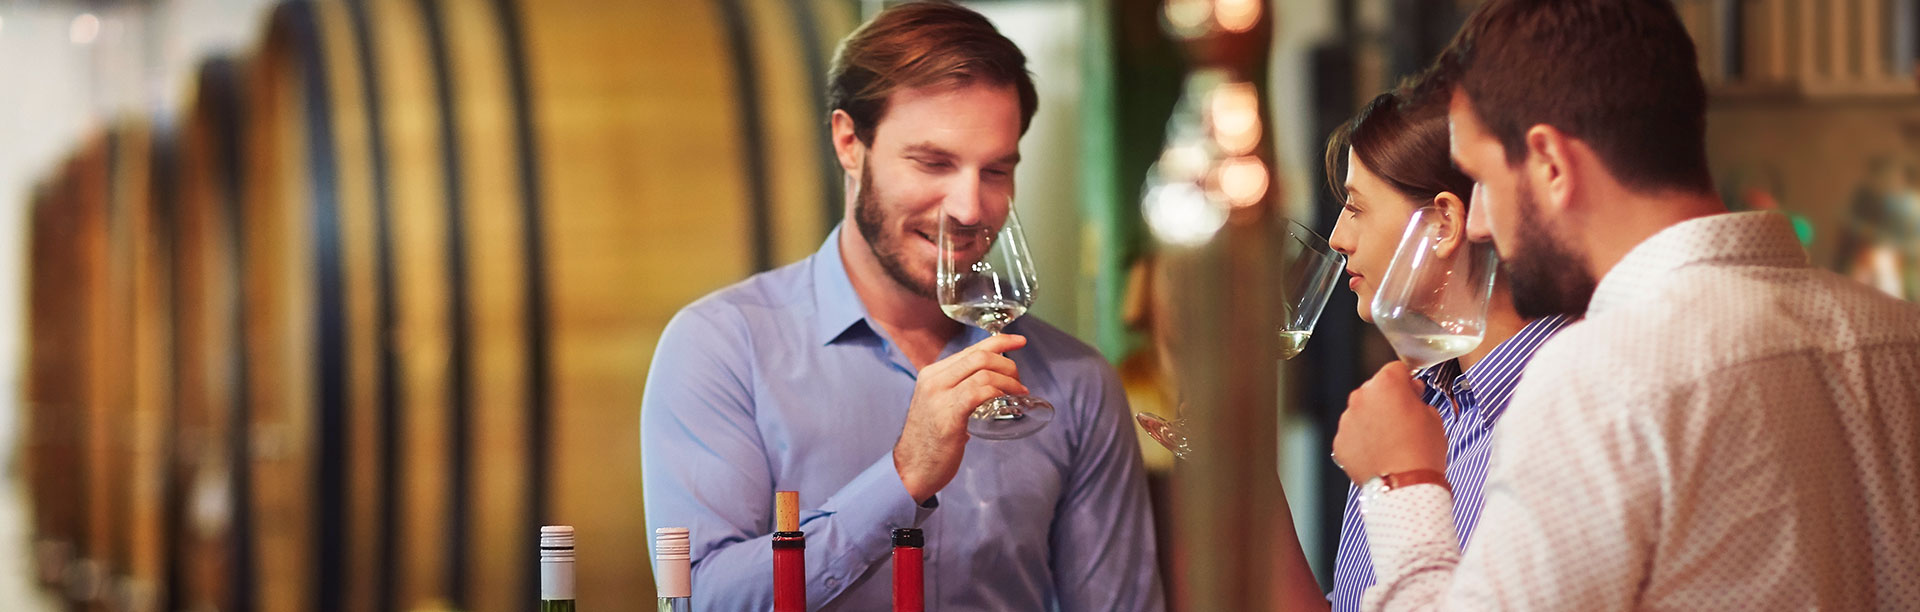 Ancient Peaks Winery at Holiday Inn Express Hotel & Suites Atascadero